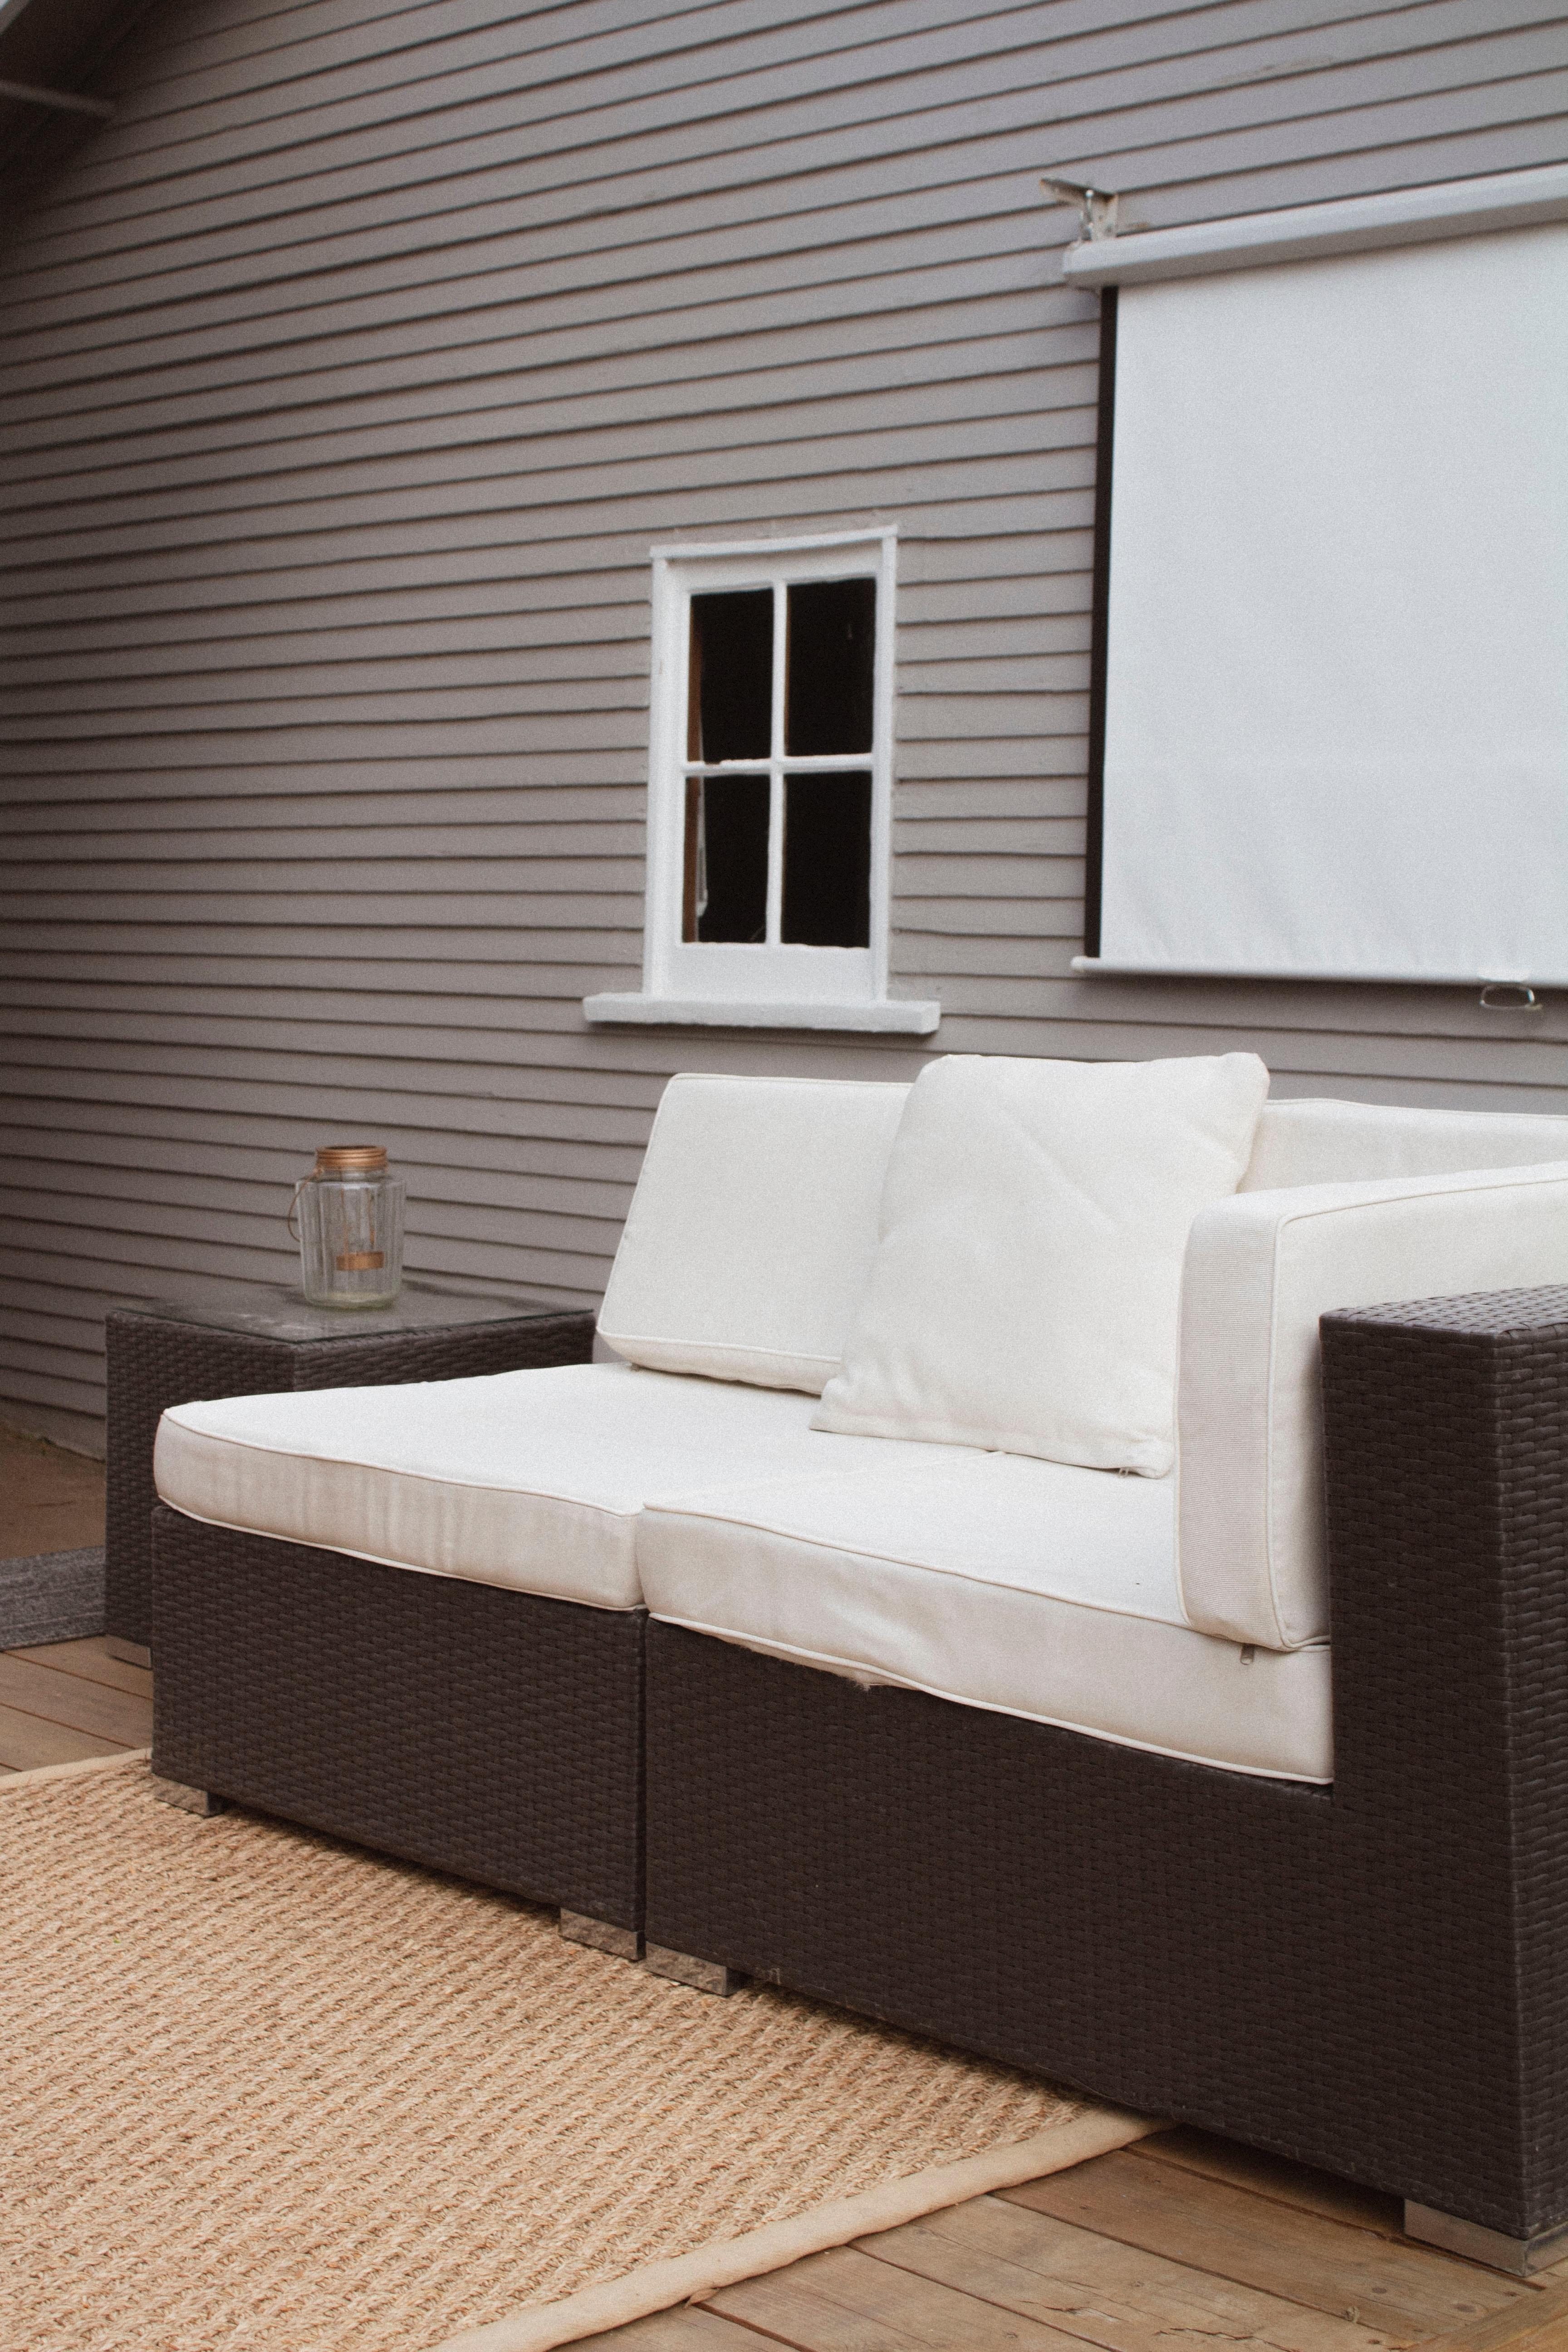 essentiel jardin mobilier confortable